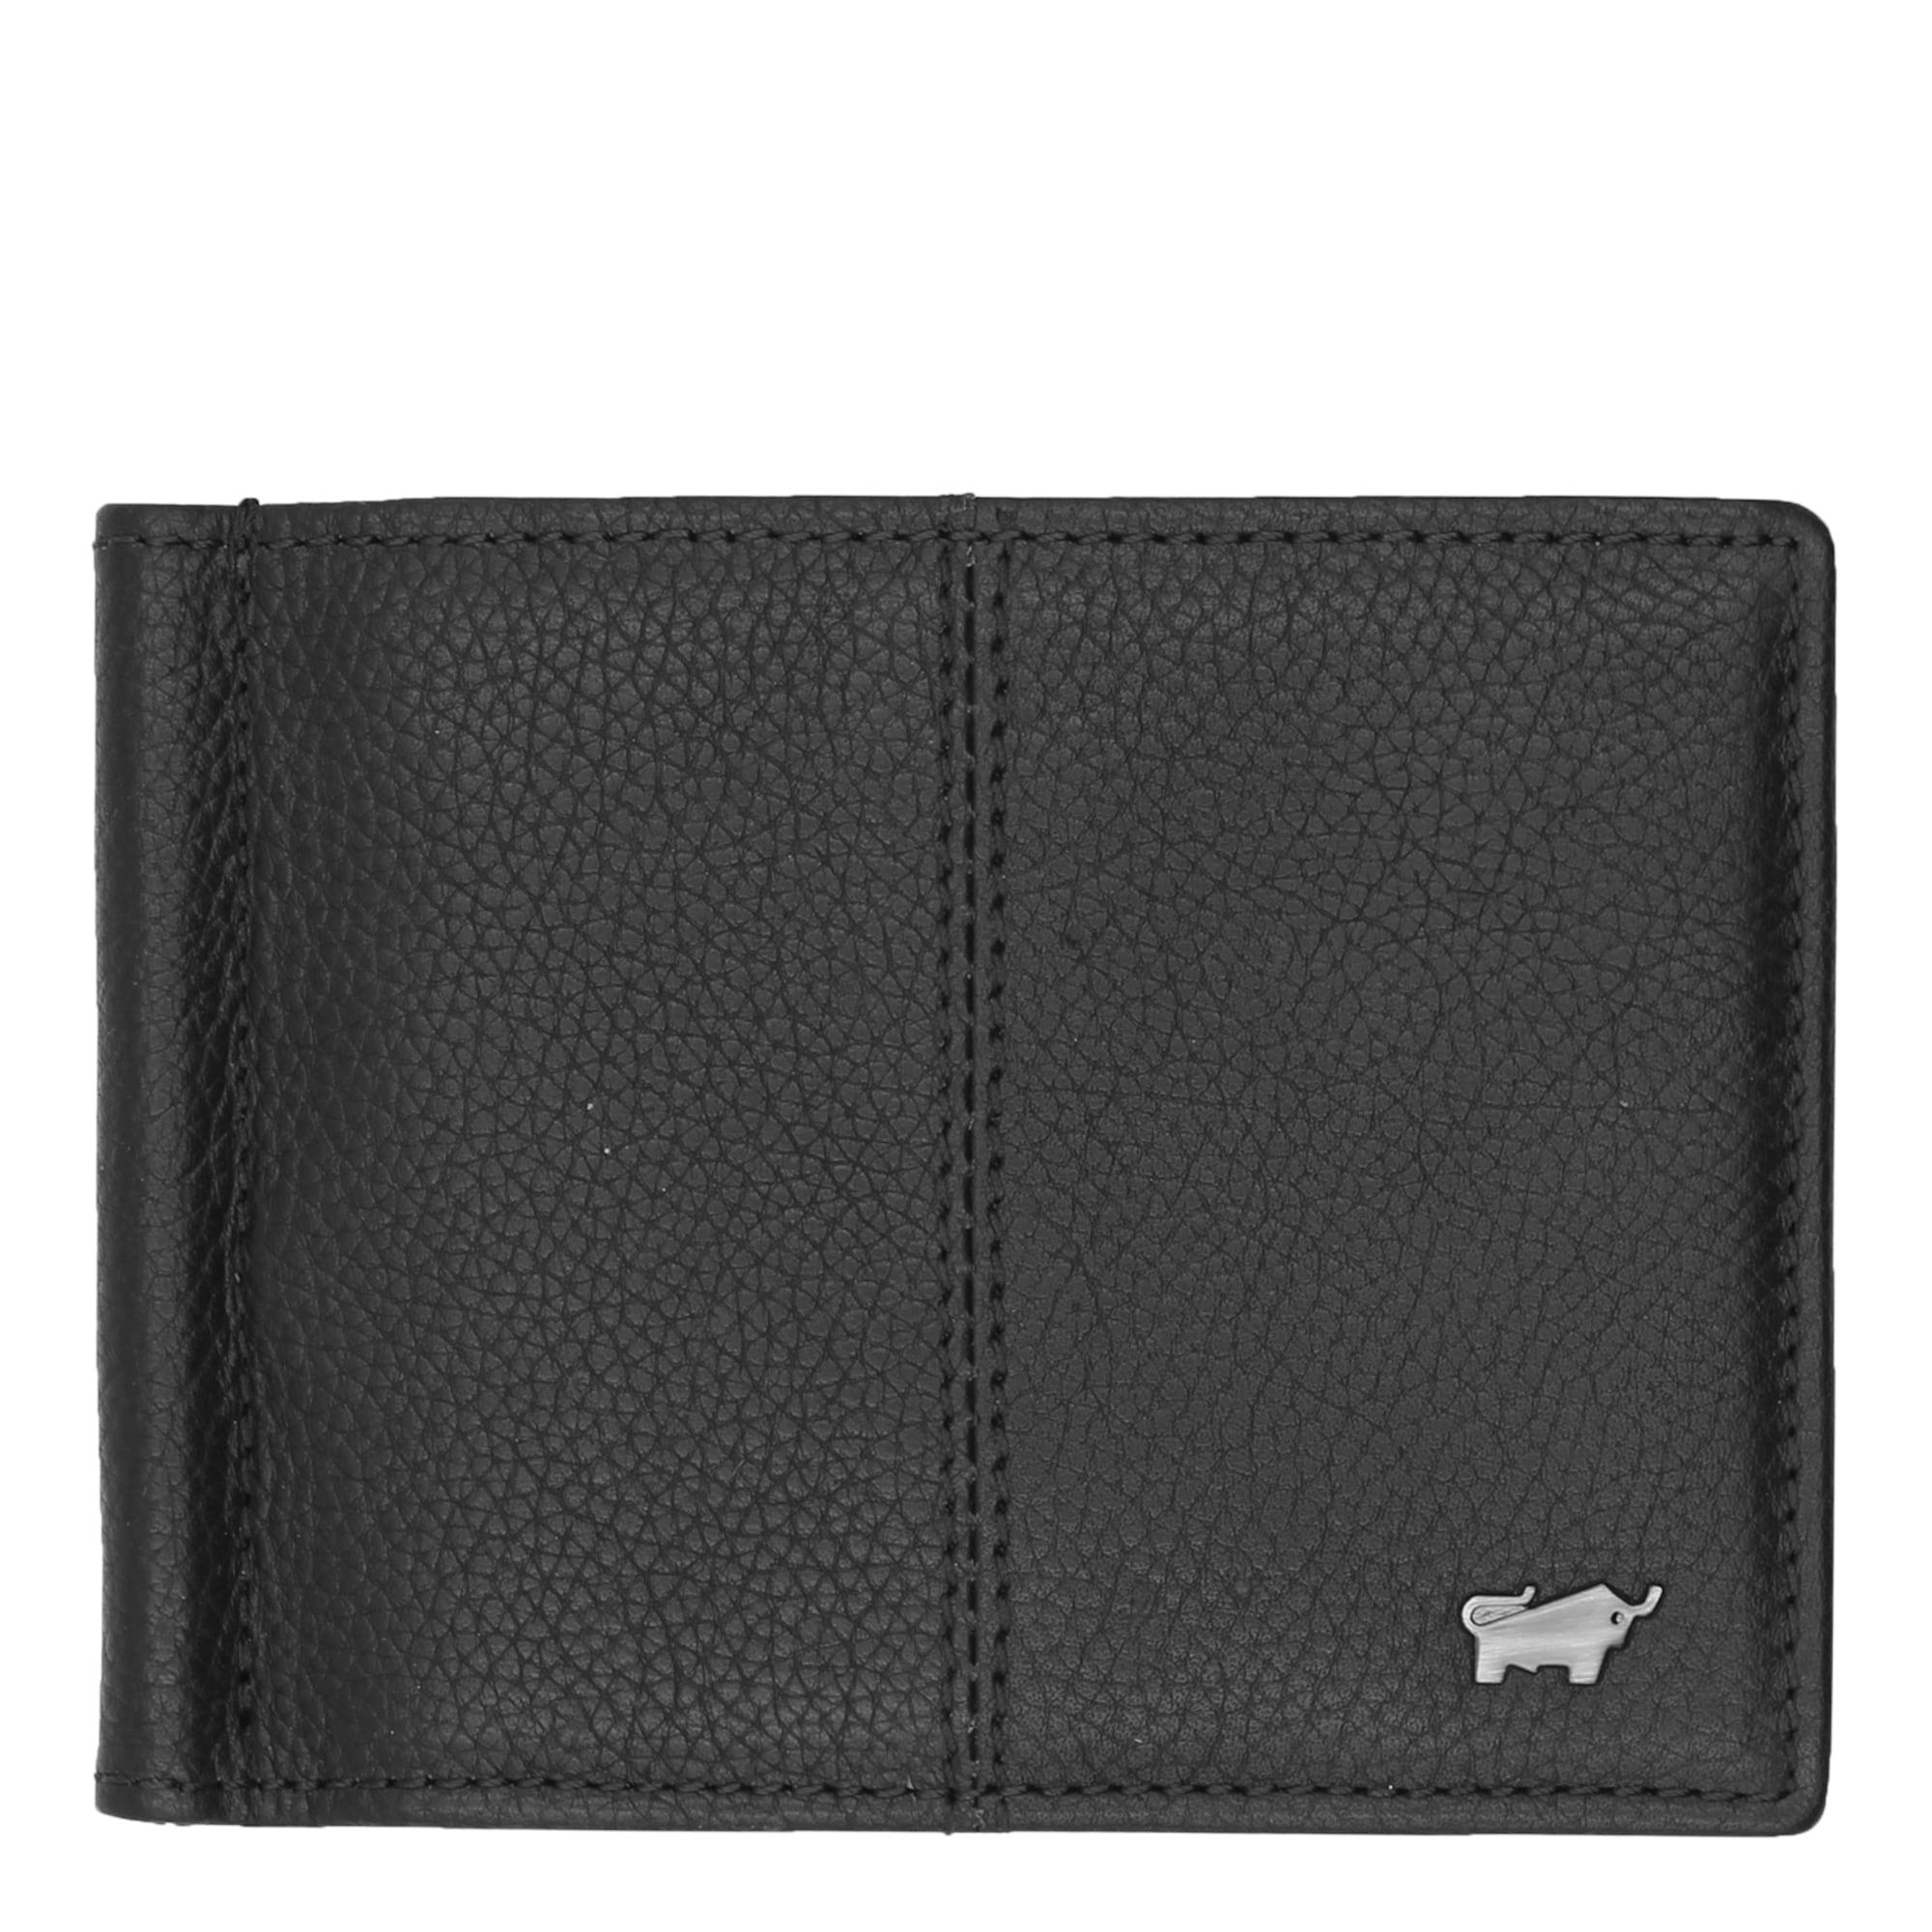 Portemonnaie | Accessoires > Portemonnaies > Sonstige Portemonnaies | Braun Büffel